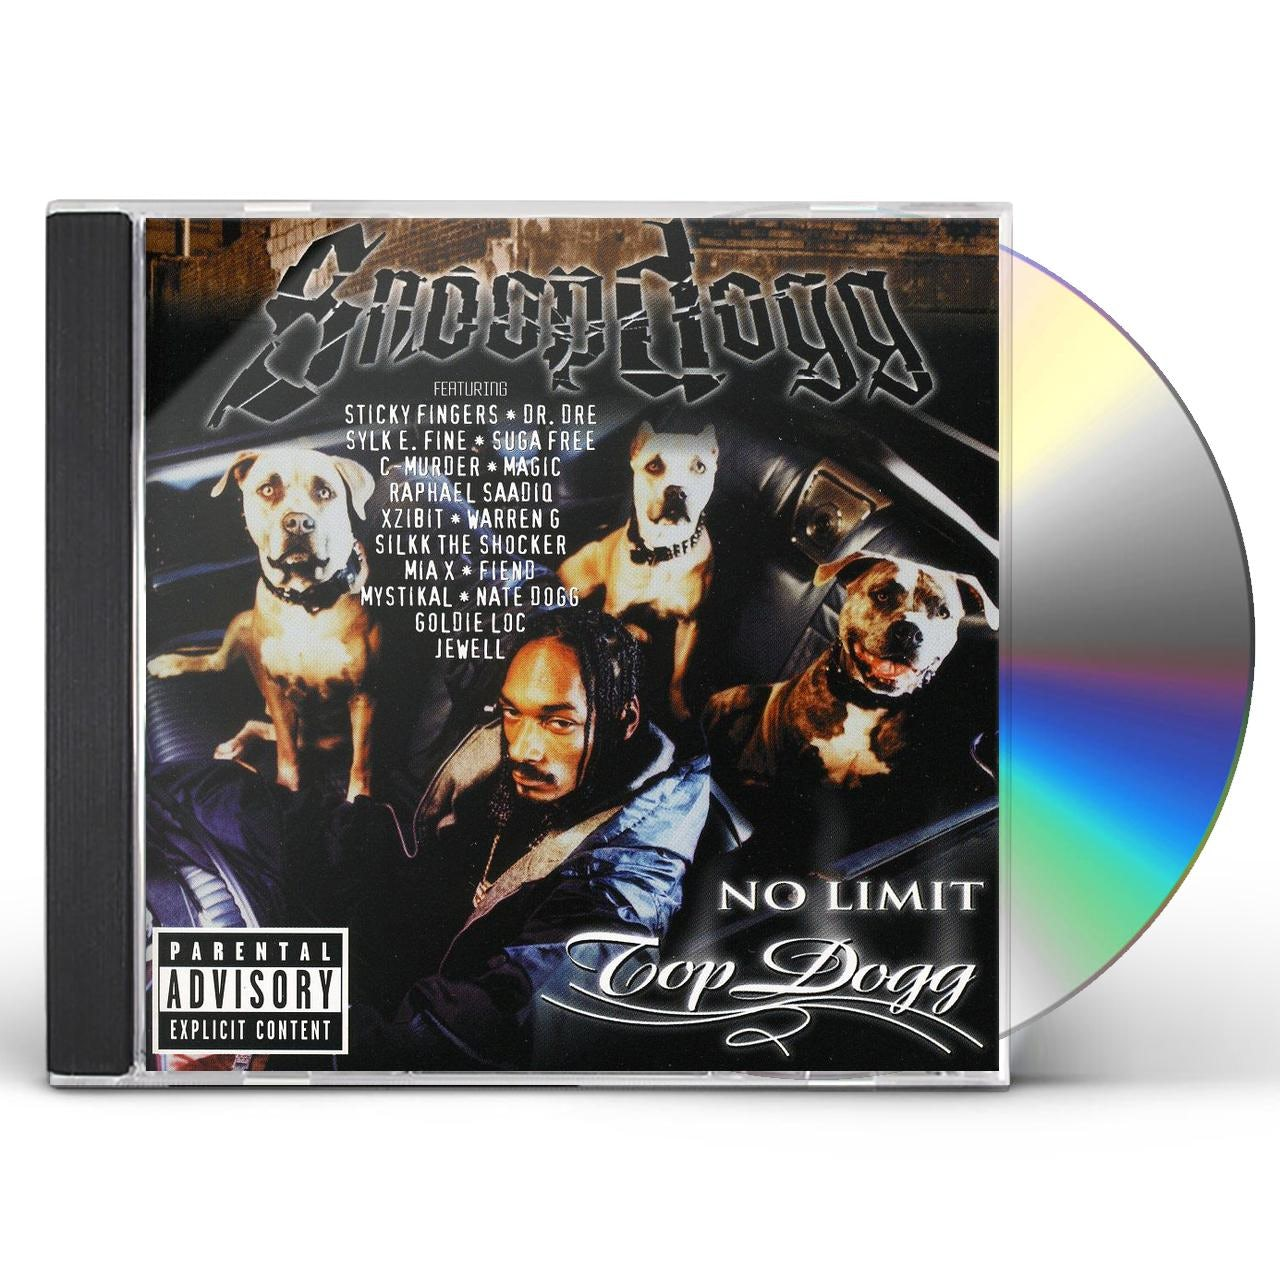 Snoop Dogg TOP DOGG CD